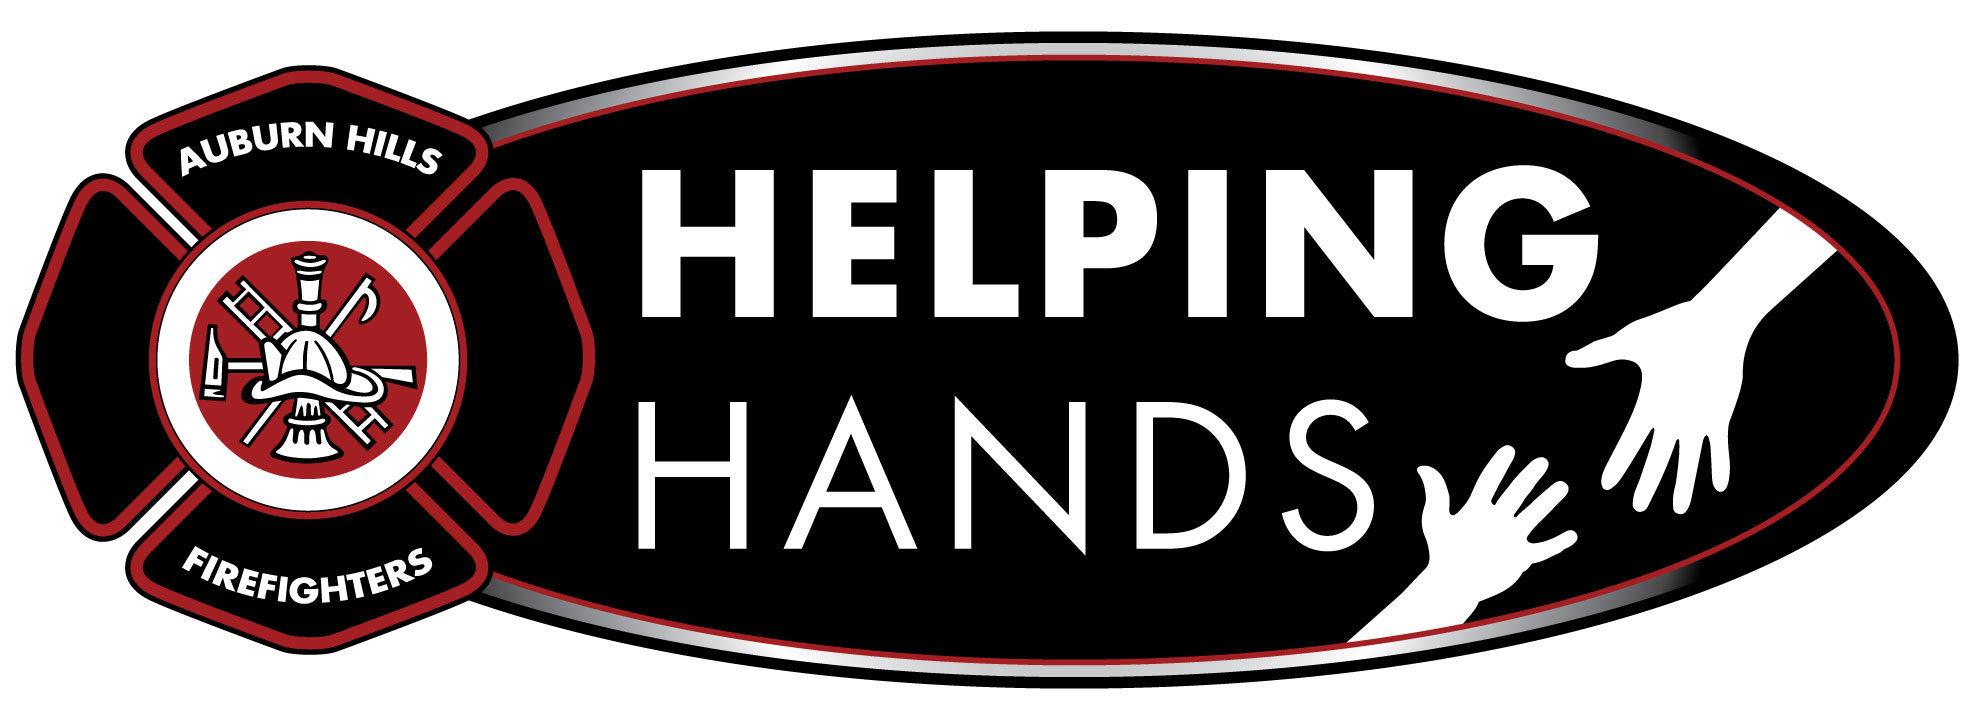 Auburn Hills Firefighters Helping Hands